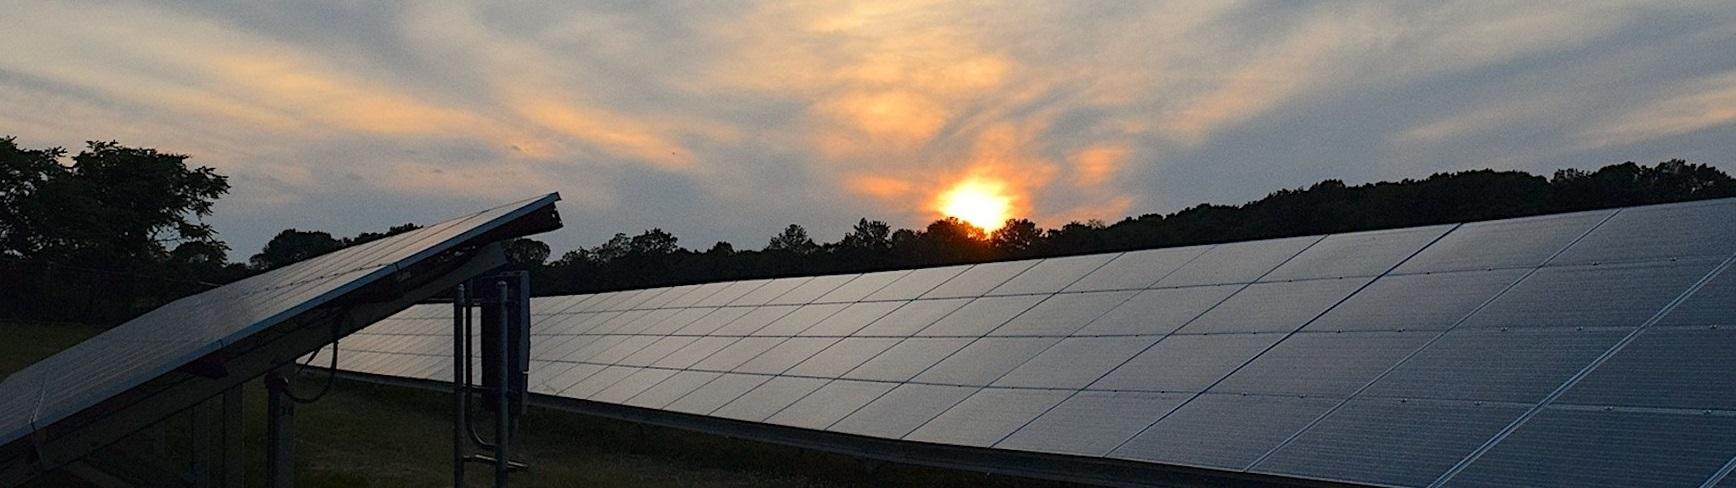 banner solar panel